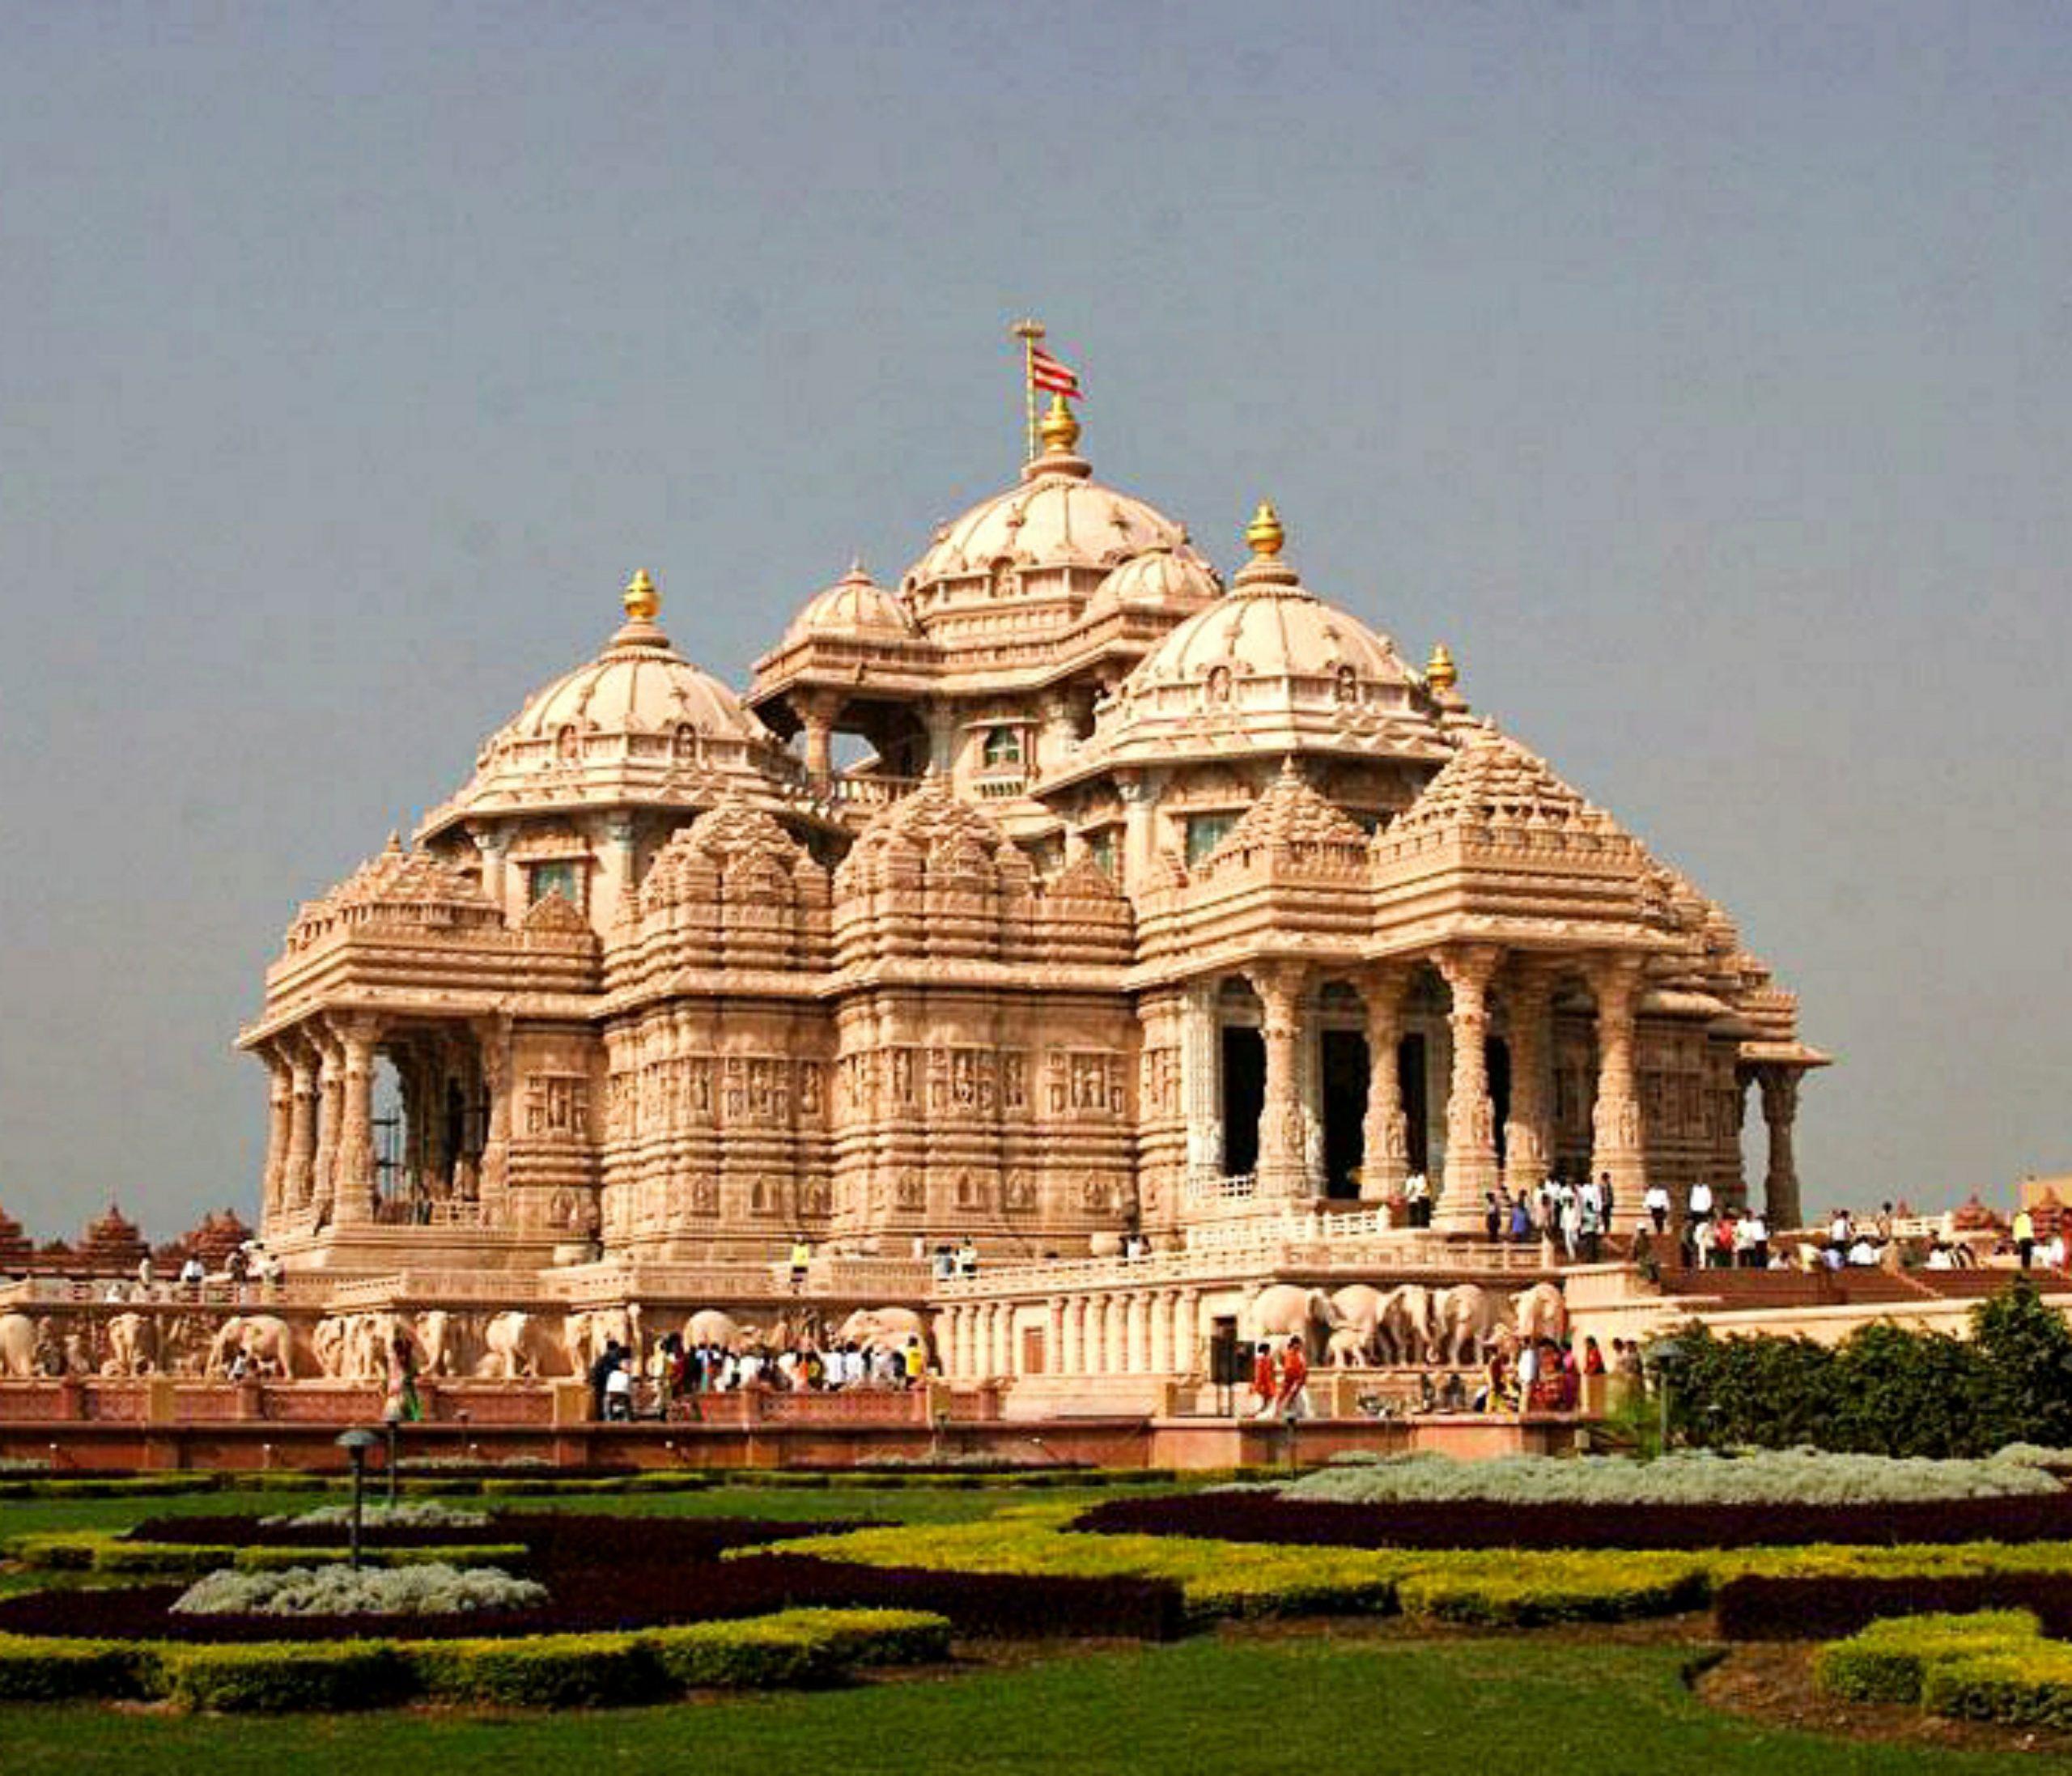 Swaminarayan Akshardham Temple in Delhi